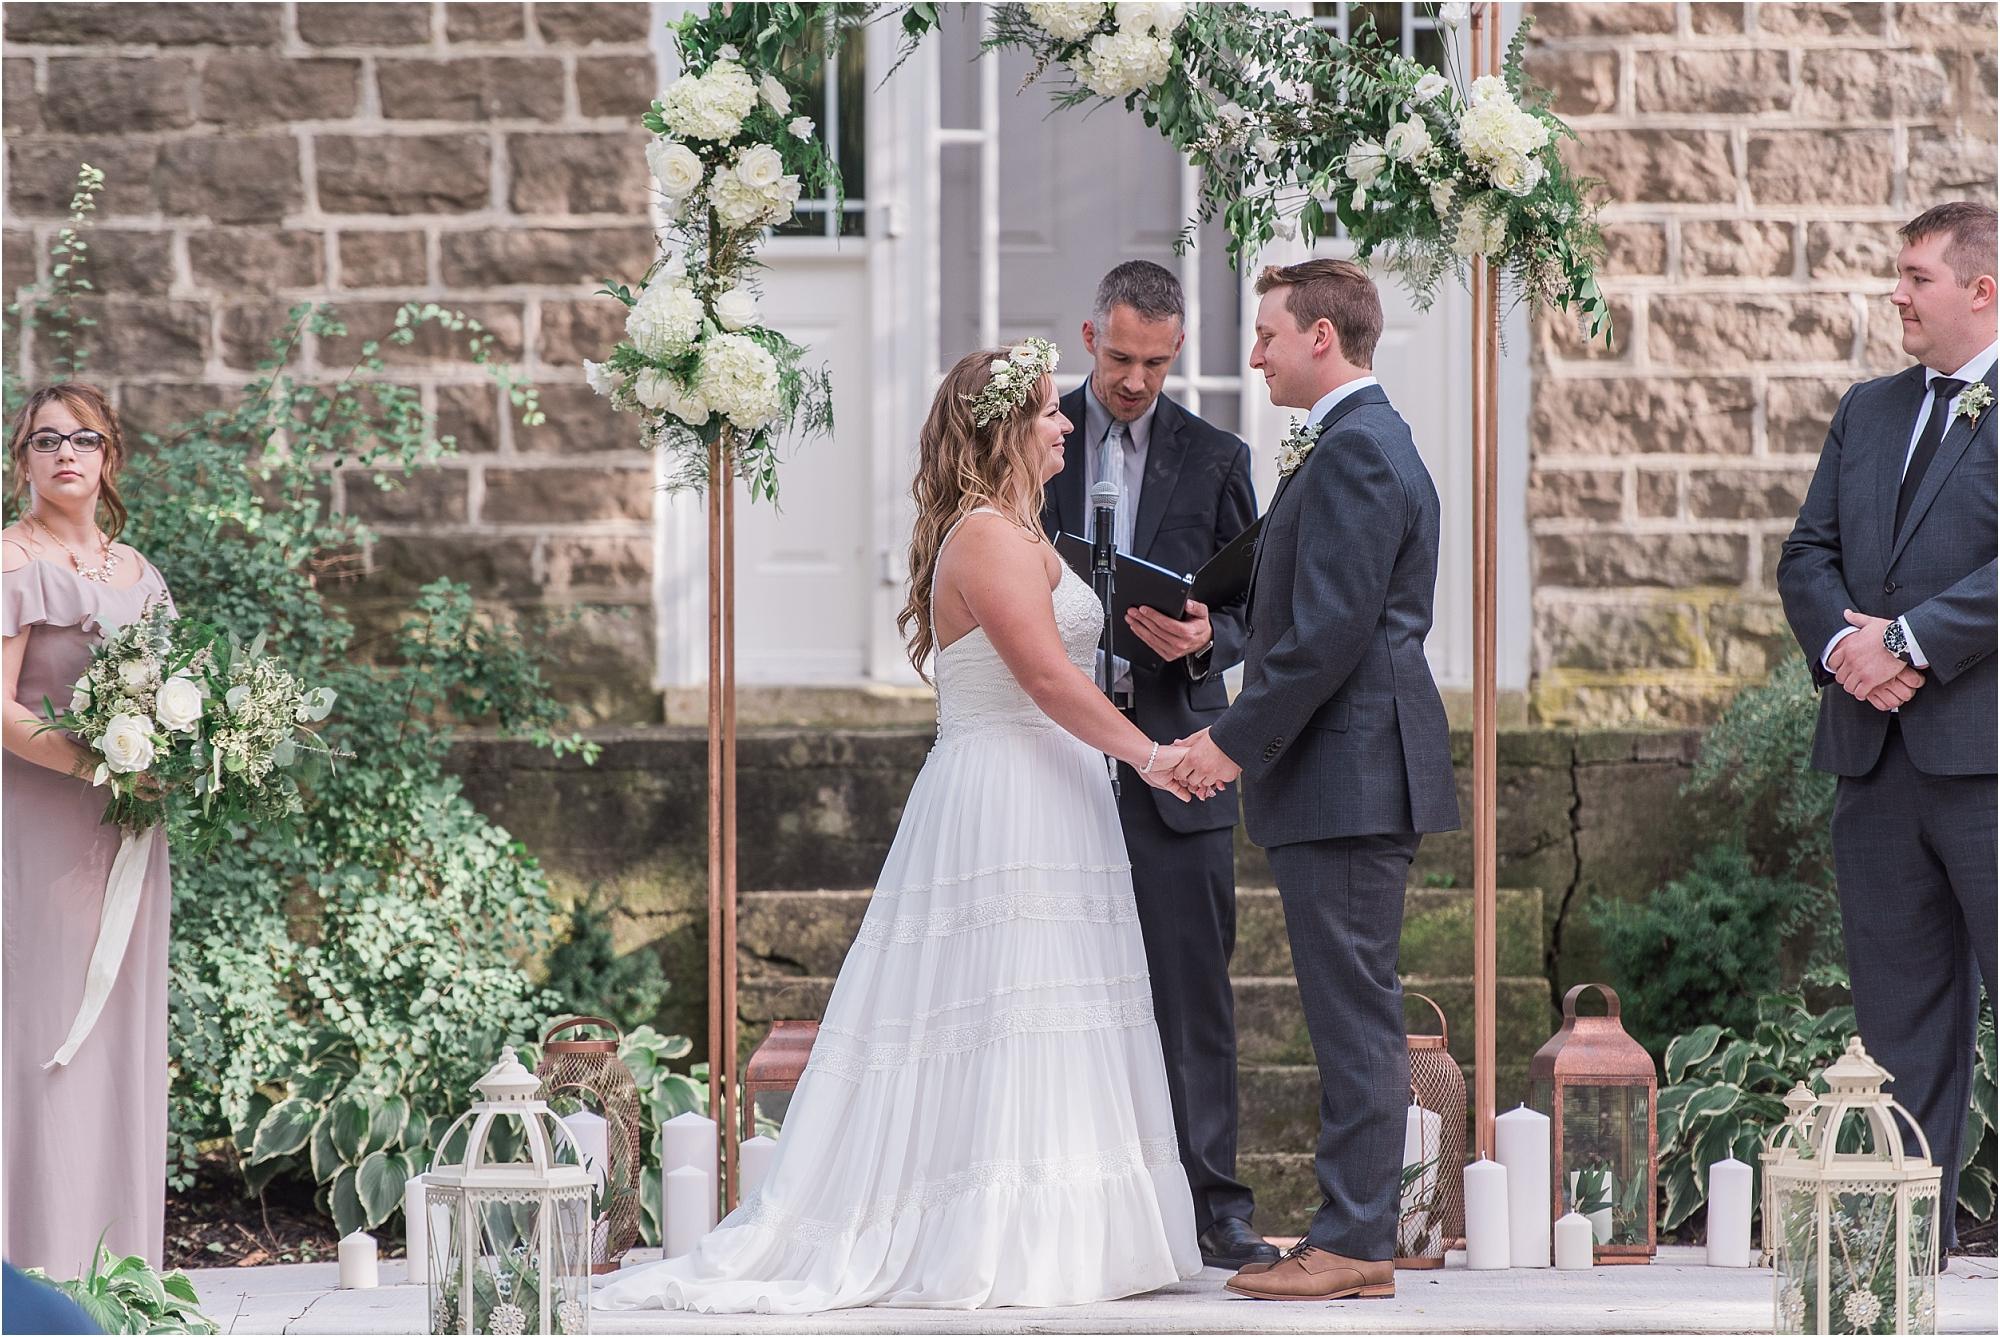 0070 Summer Stonefields Wedding Carleton Place - Ottawa Wedding - Photography by Emma_WEB.jpg